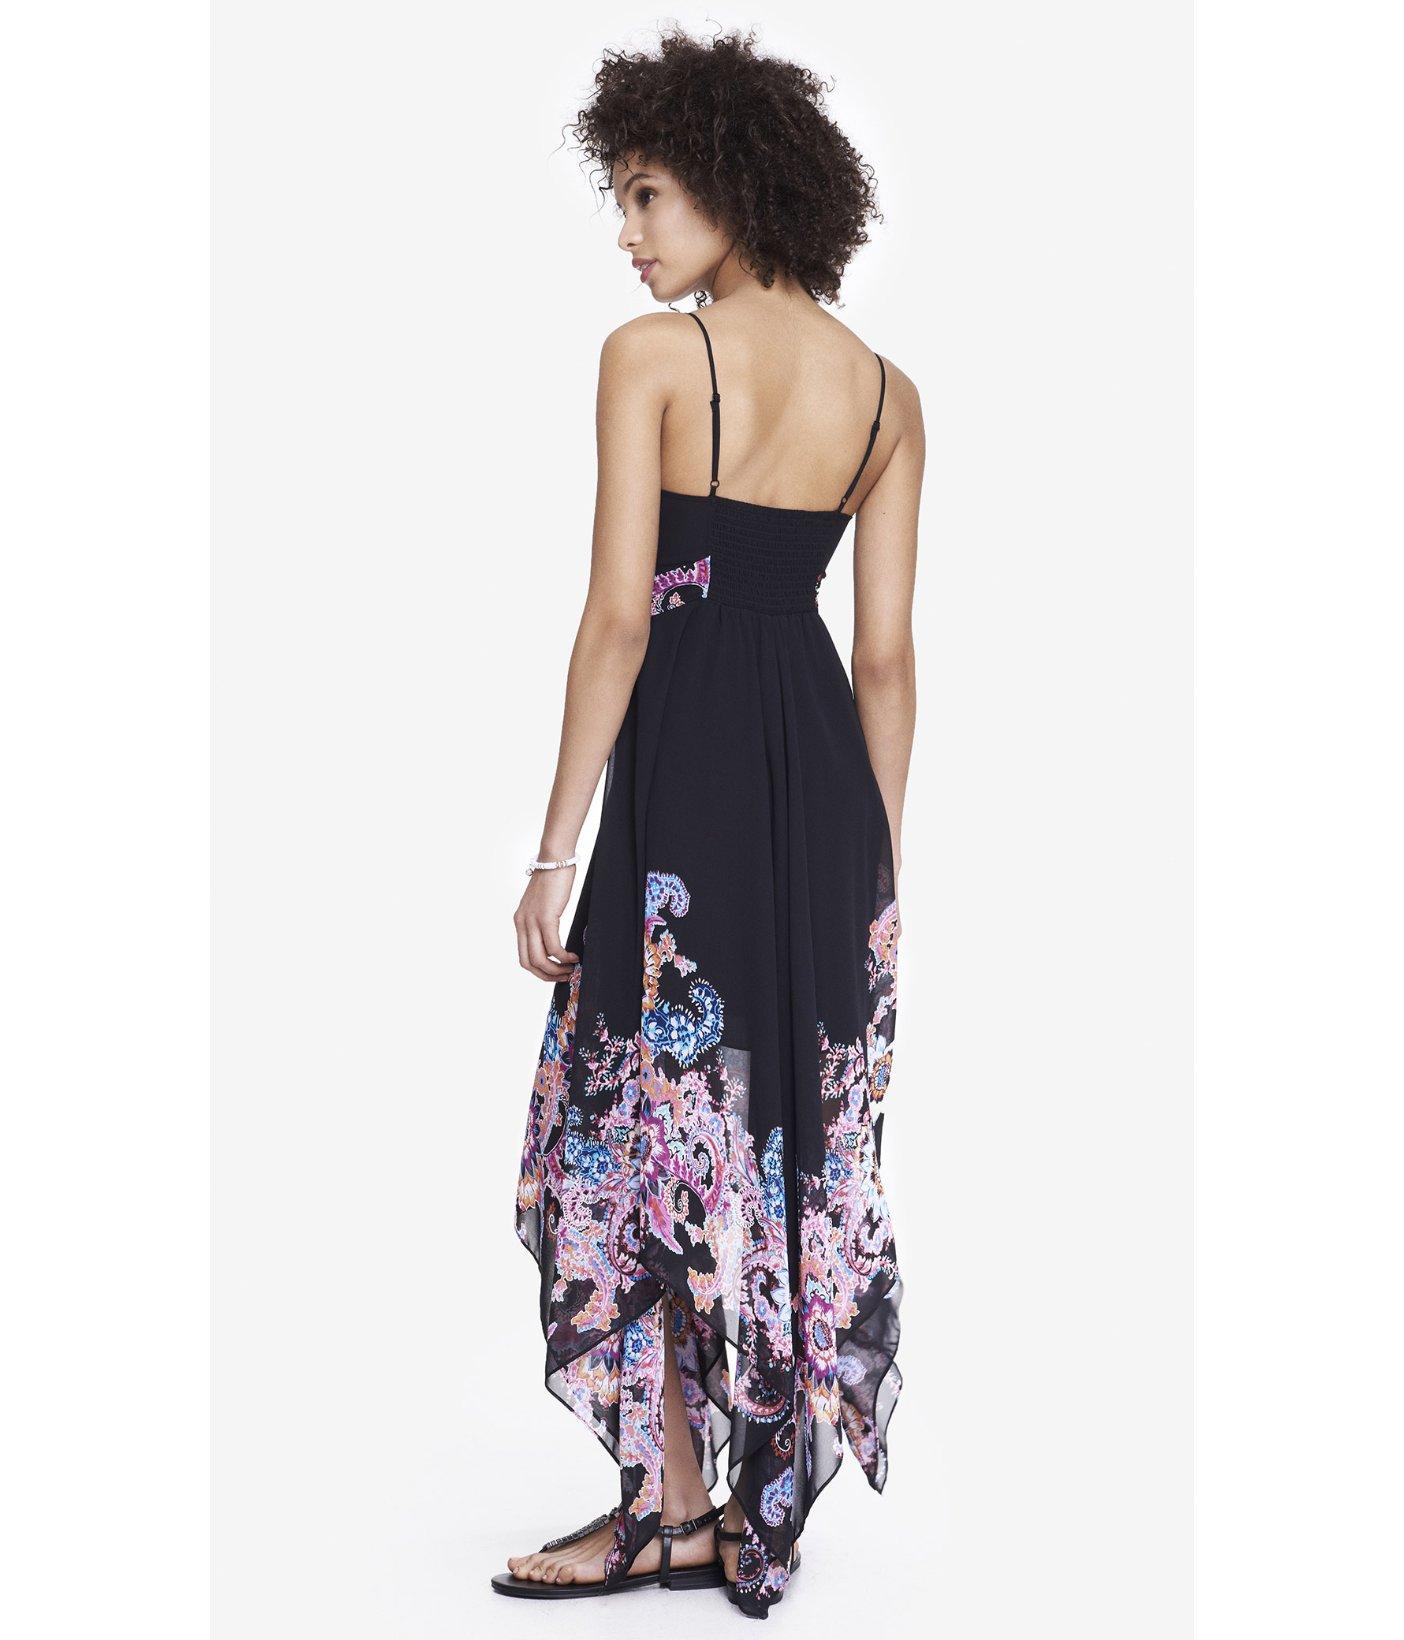 Express Placed Floral Handkerchief Hem Maxi Dress In Black